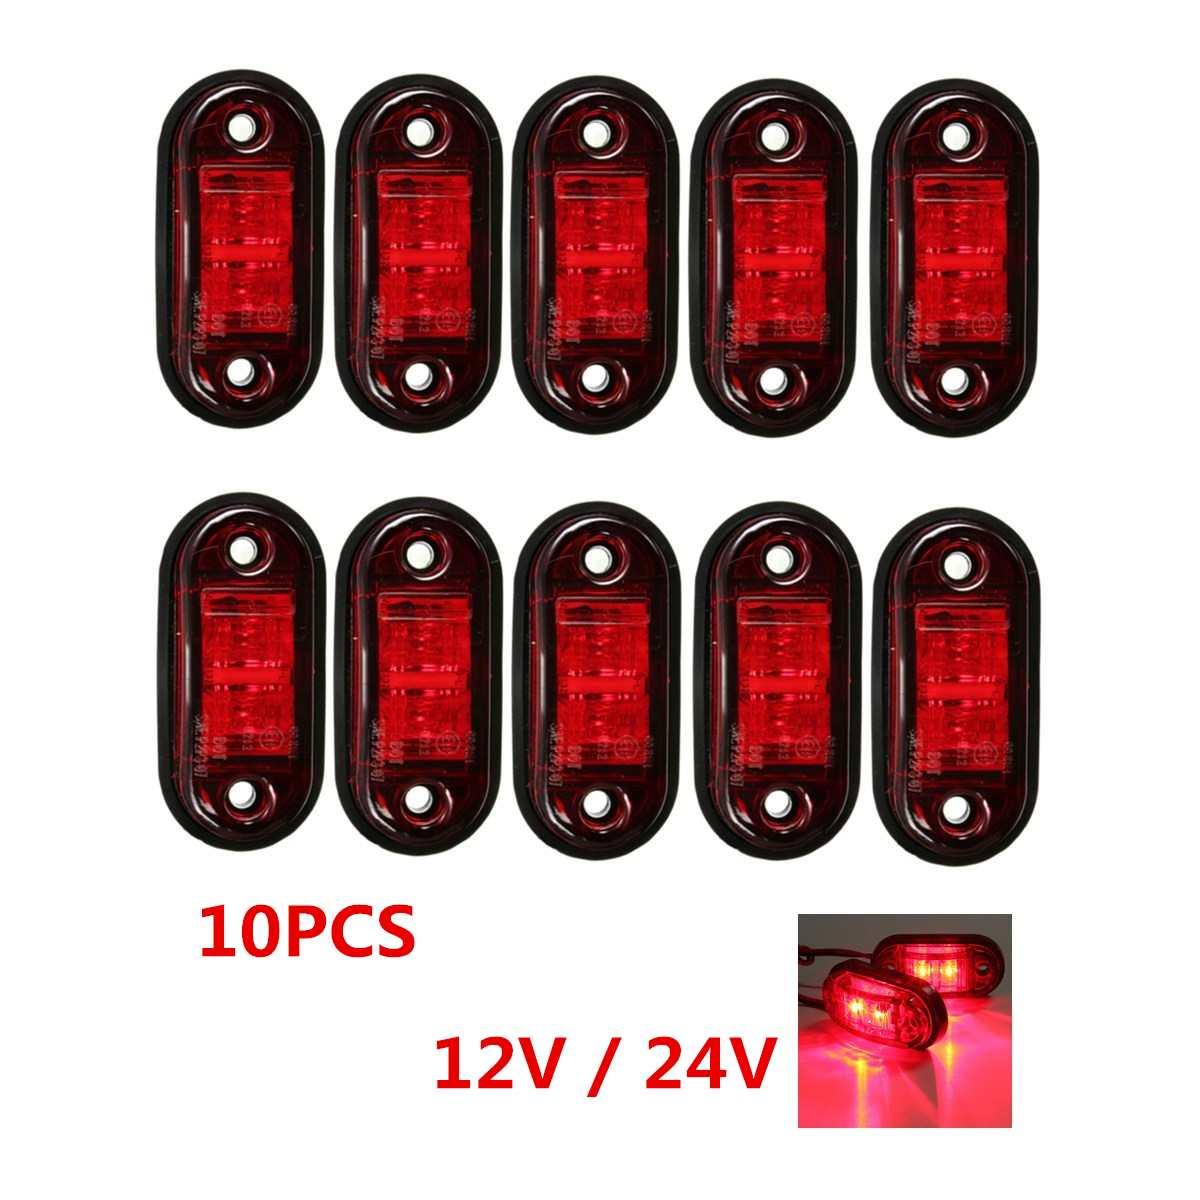 10pcs 12V 24V LED Car Truck Side Marker Lights Clearance Lamp Signal Indicator Lamp Tail Light Red Trailer Boat Bus Lorry